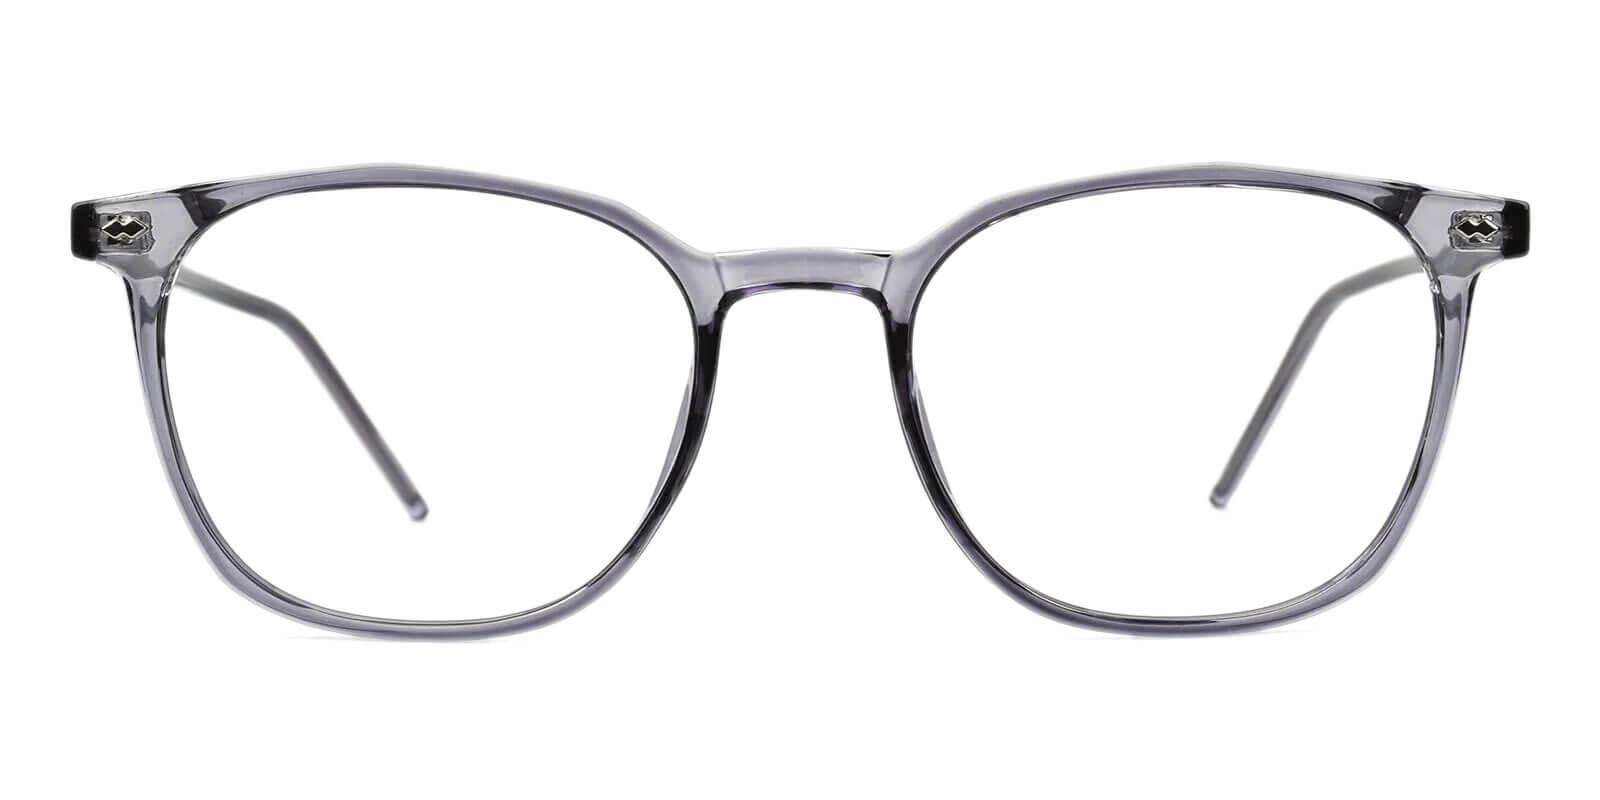 Prodigy Gray Acetate Eyeglasses , SpringHinges , UniversalBridgeFit Frames from ABBE Glasses